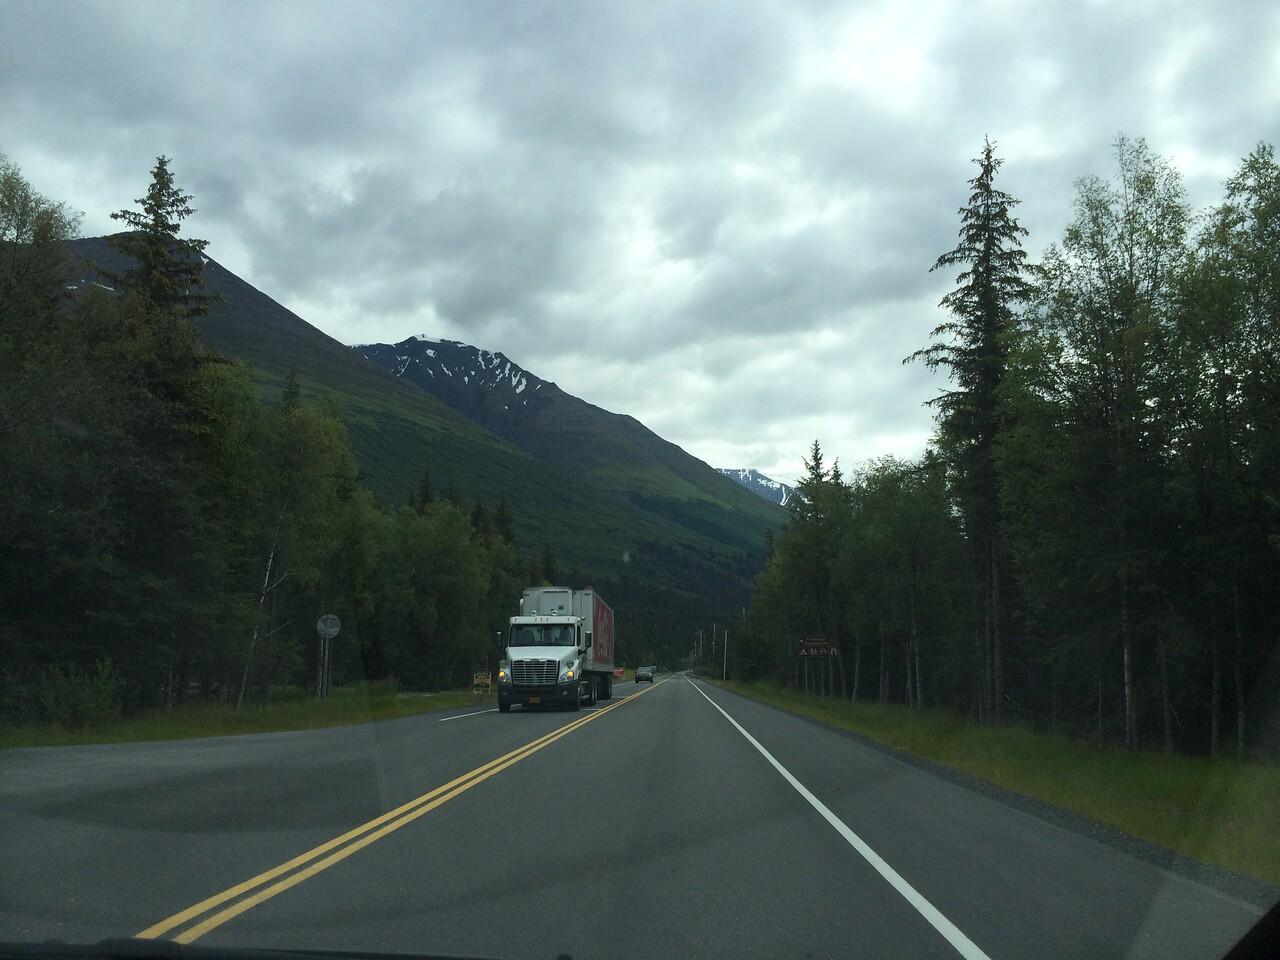 What a major highway looks like in Alaska.